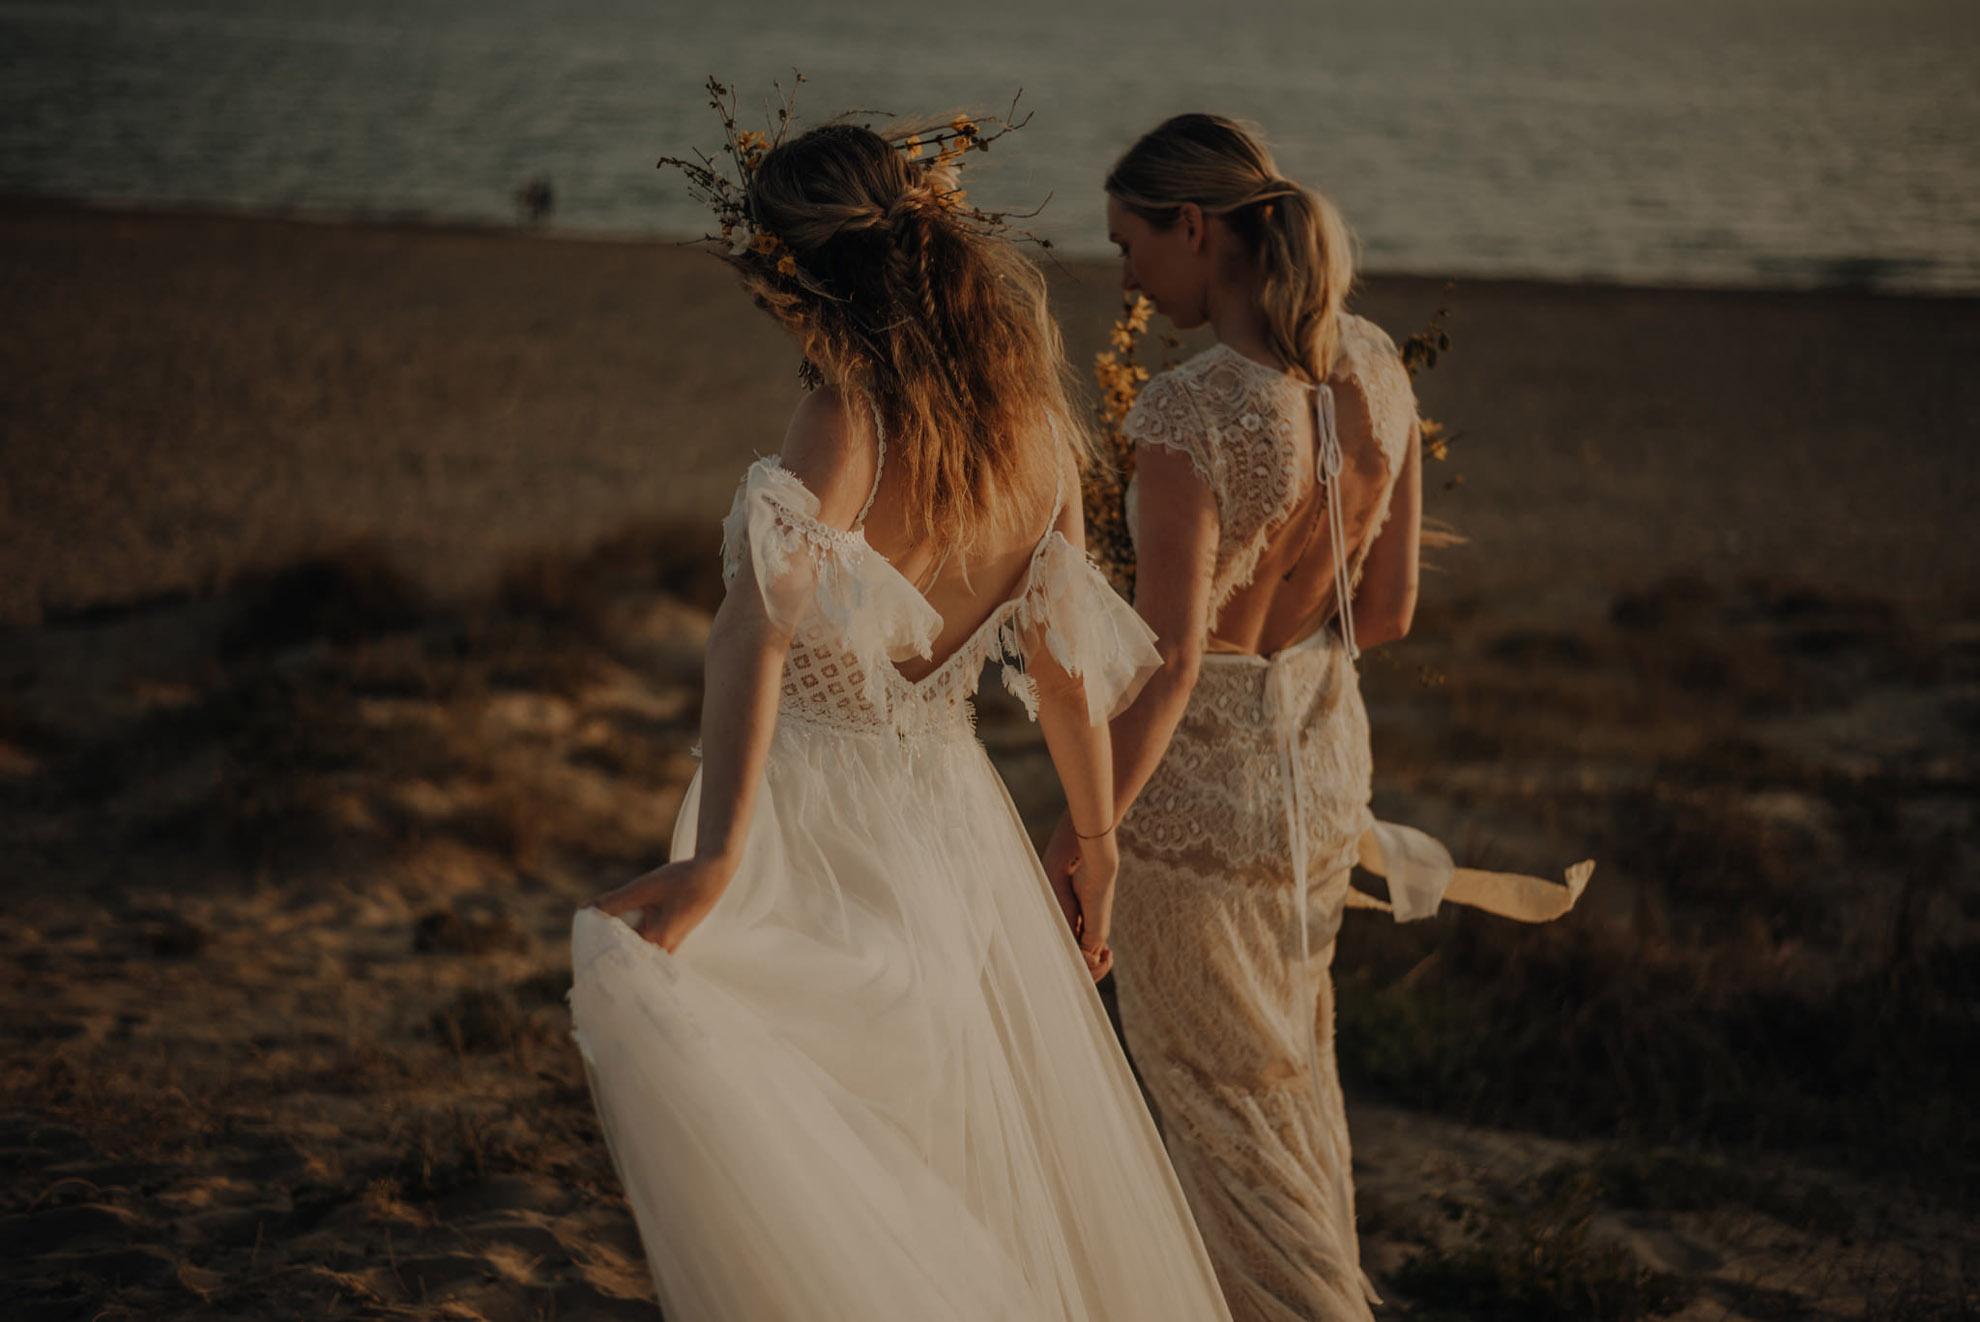 AmorVincitOmnia PHOTOGRAPHY Rita photos lesbian gay same-sex lgbtqia+ couple love Italy Rome beach Dancing With Her worldwide magazine